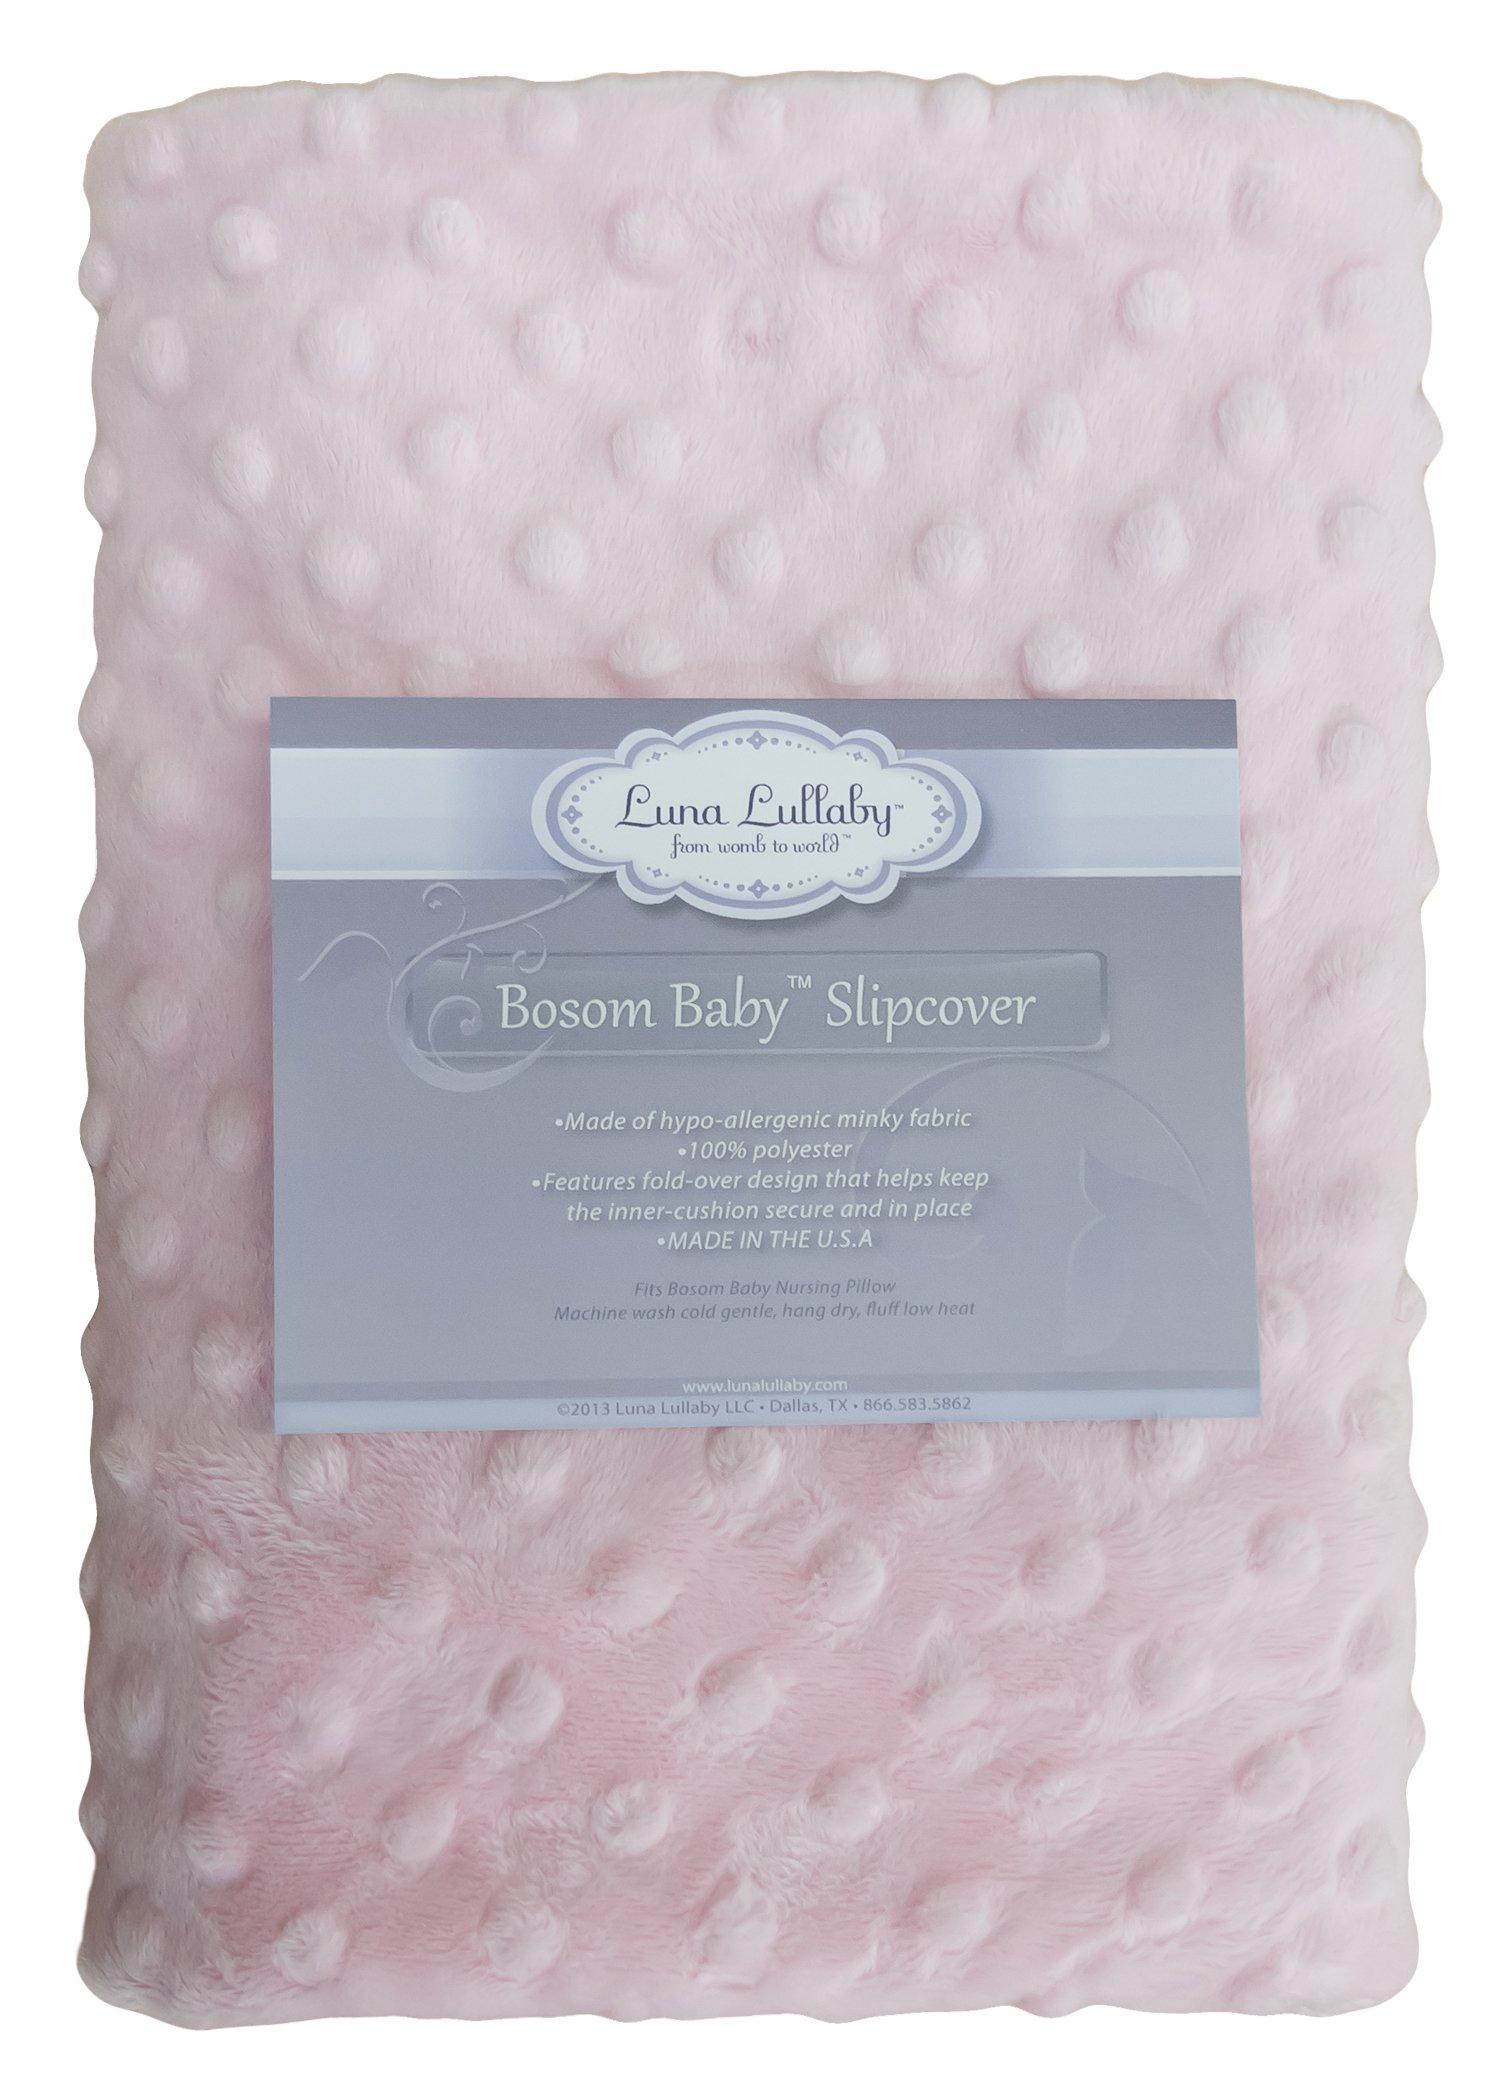 Luna Lullaby Bosom Baby Nursing Pillow Slip Cover, Pink Dot by Bosom Baby